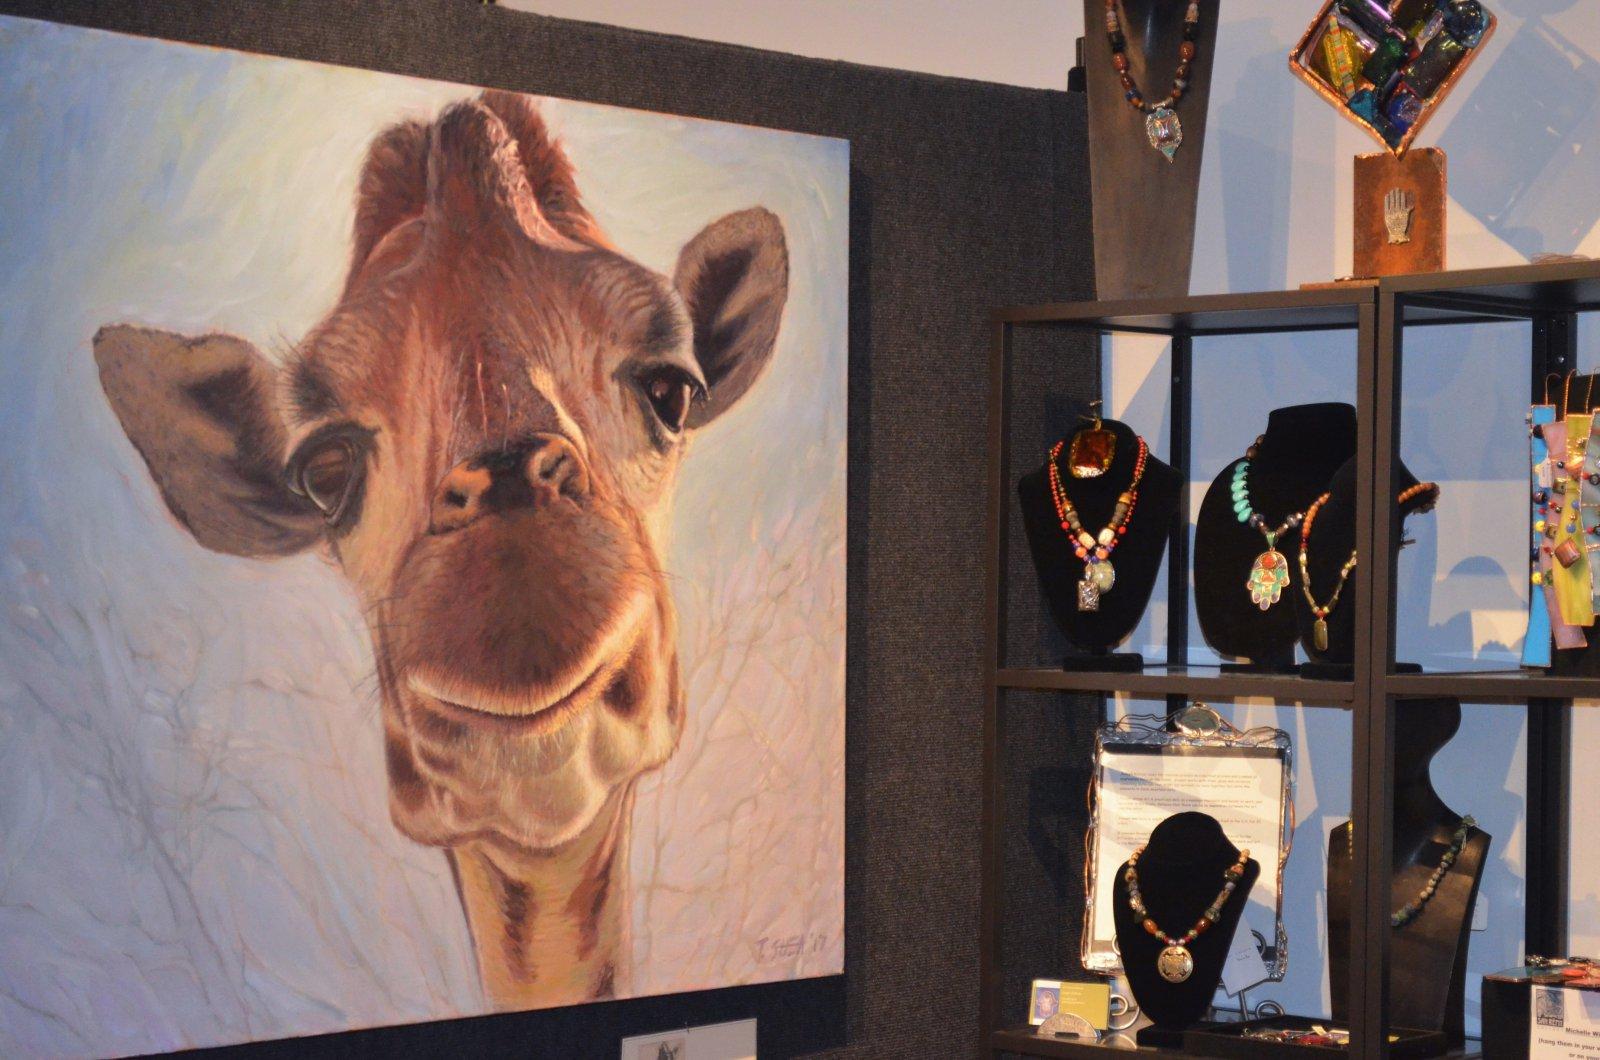 Giraffe painting by Thomas Shea